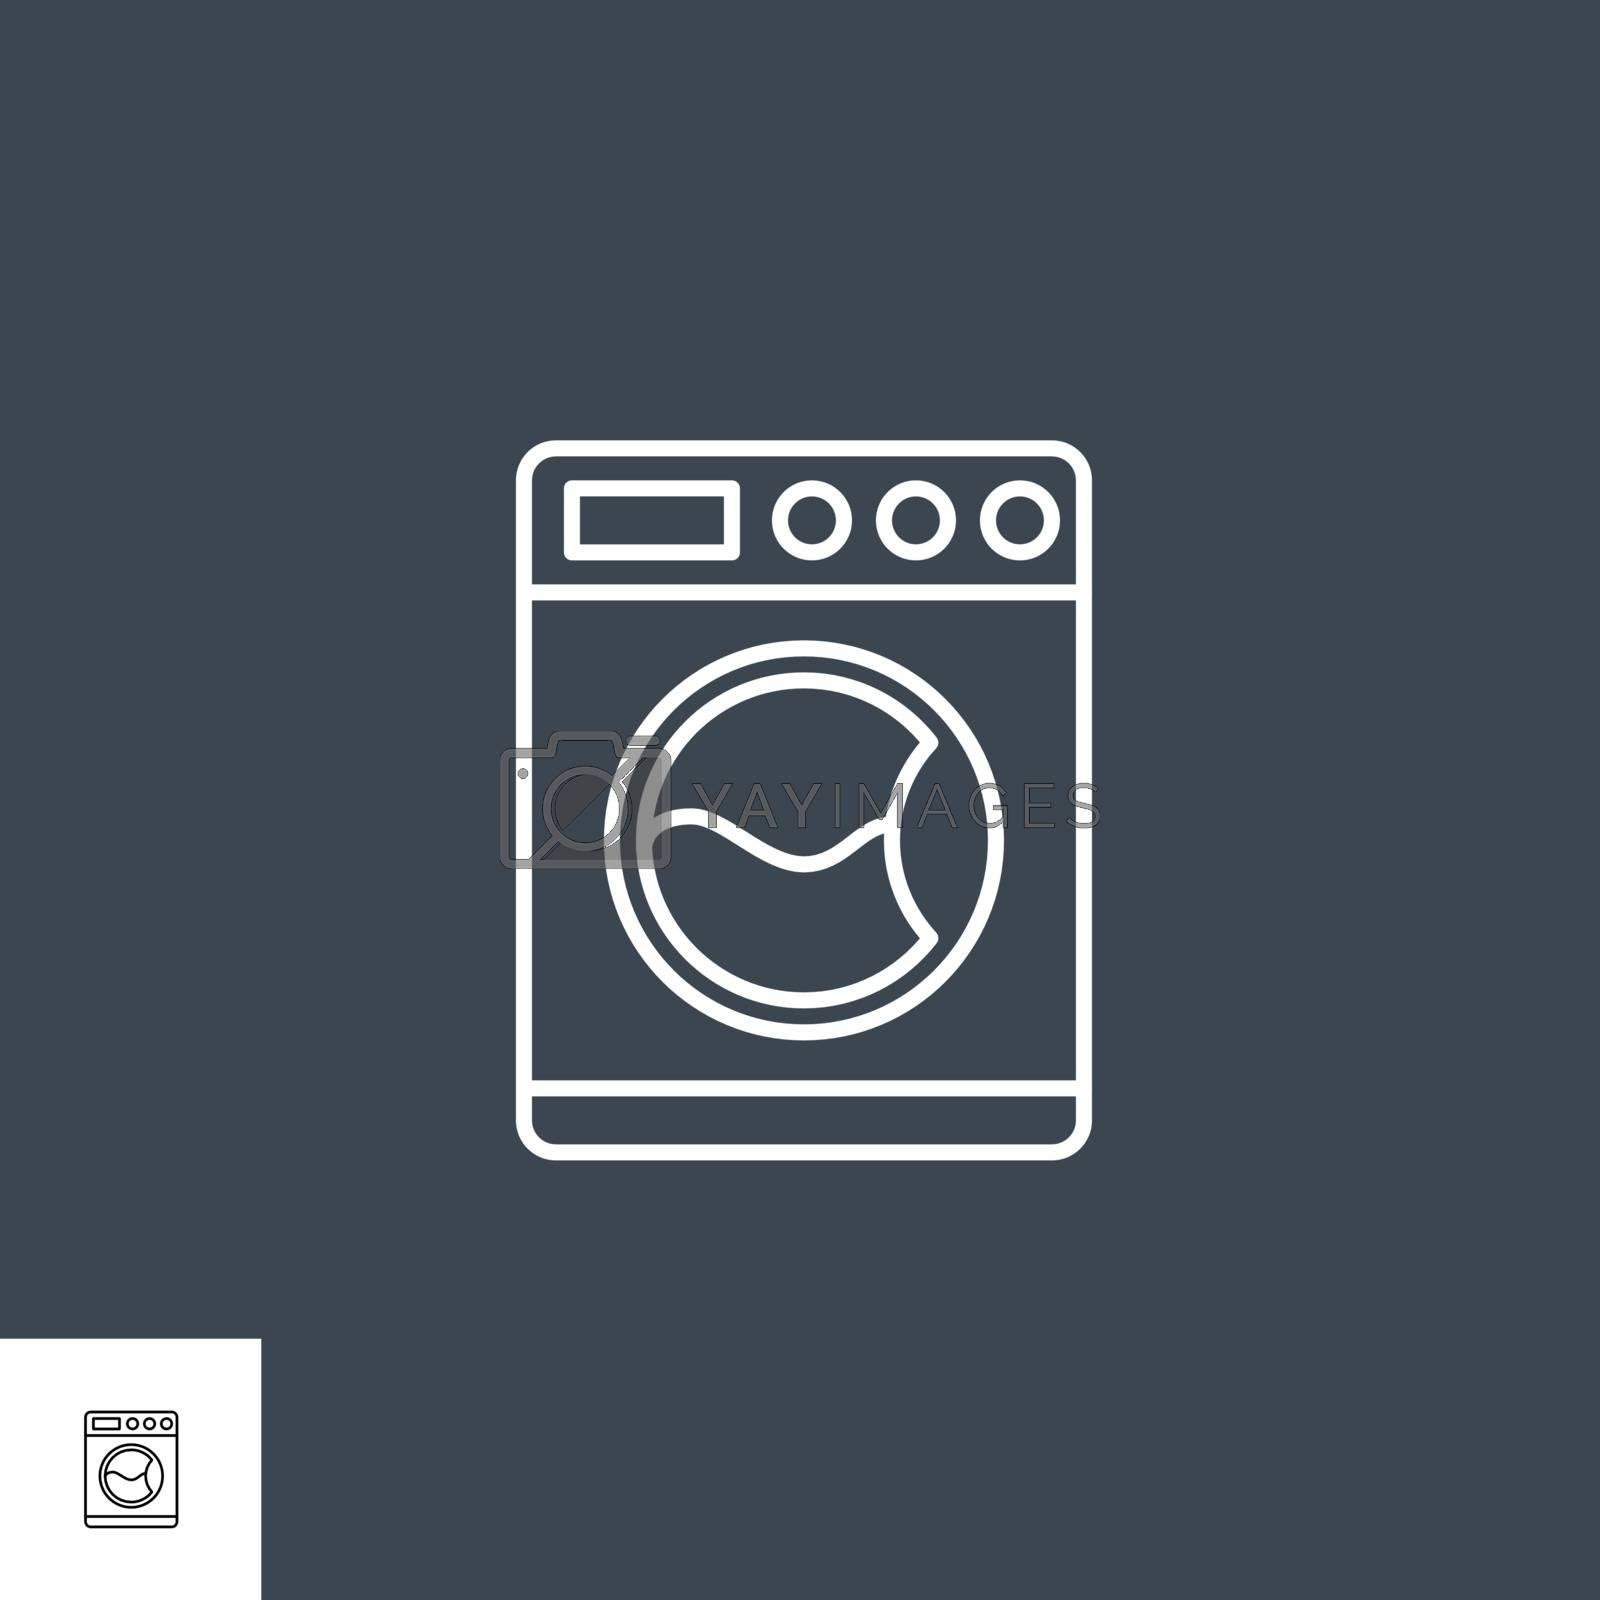 Washing Machine Related Vector Line Icon. by smoki